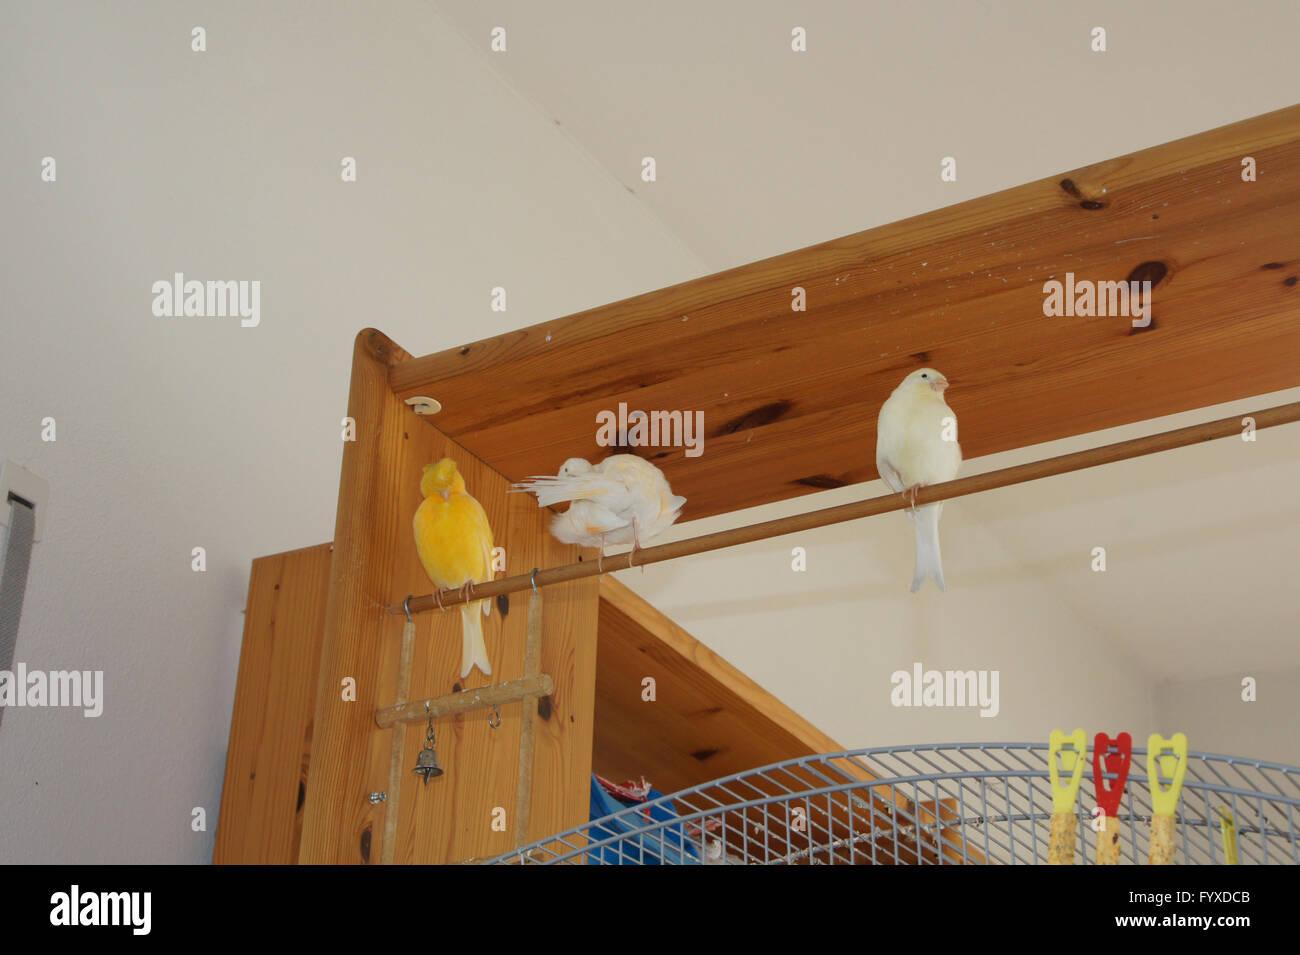 Canaries in bookshelf - Stock Image